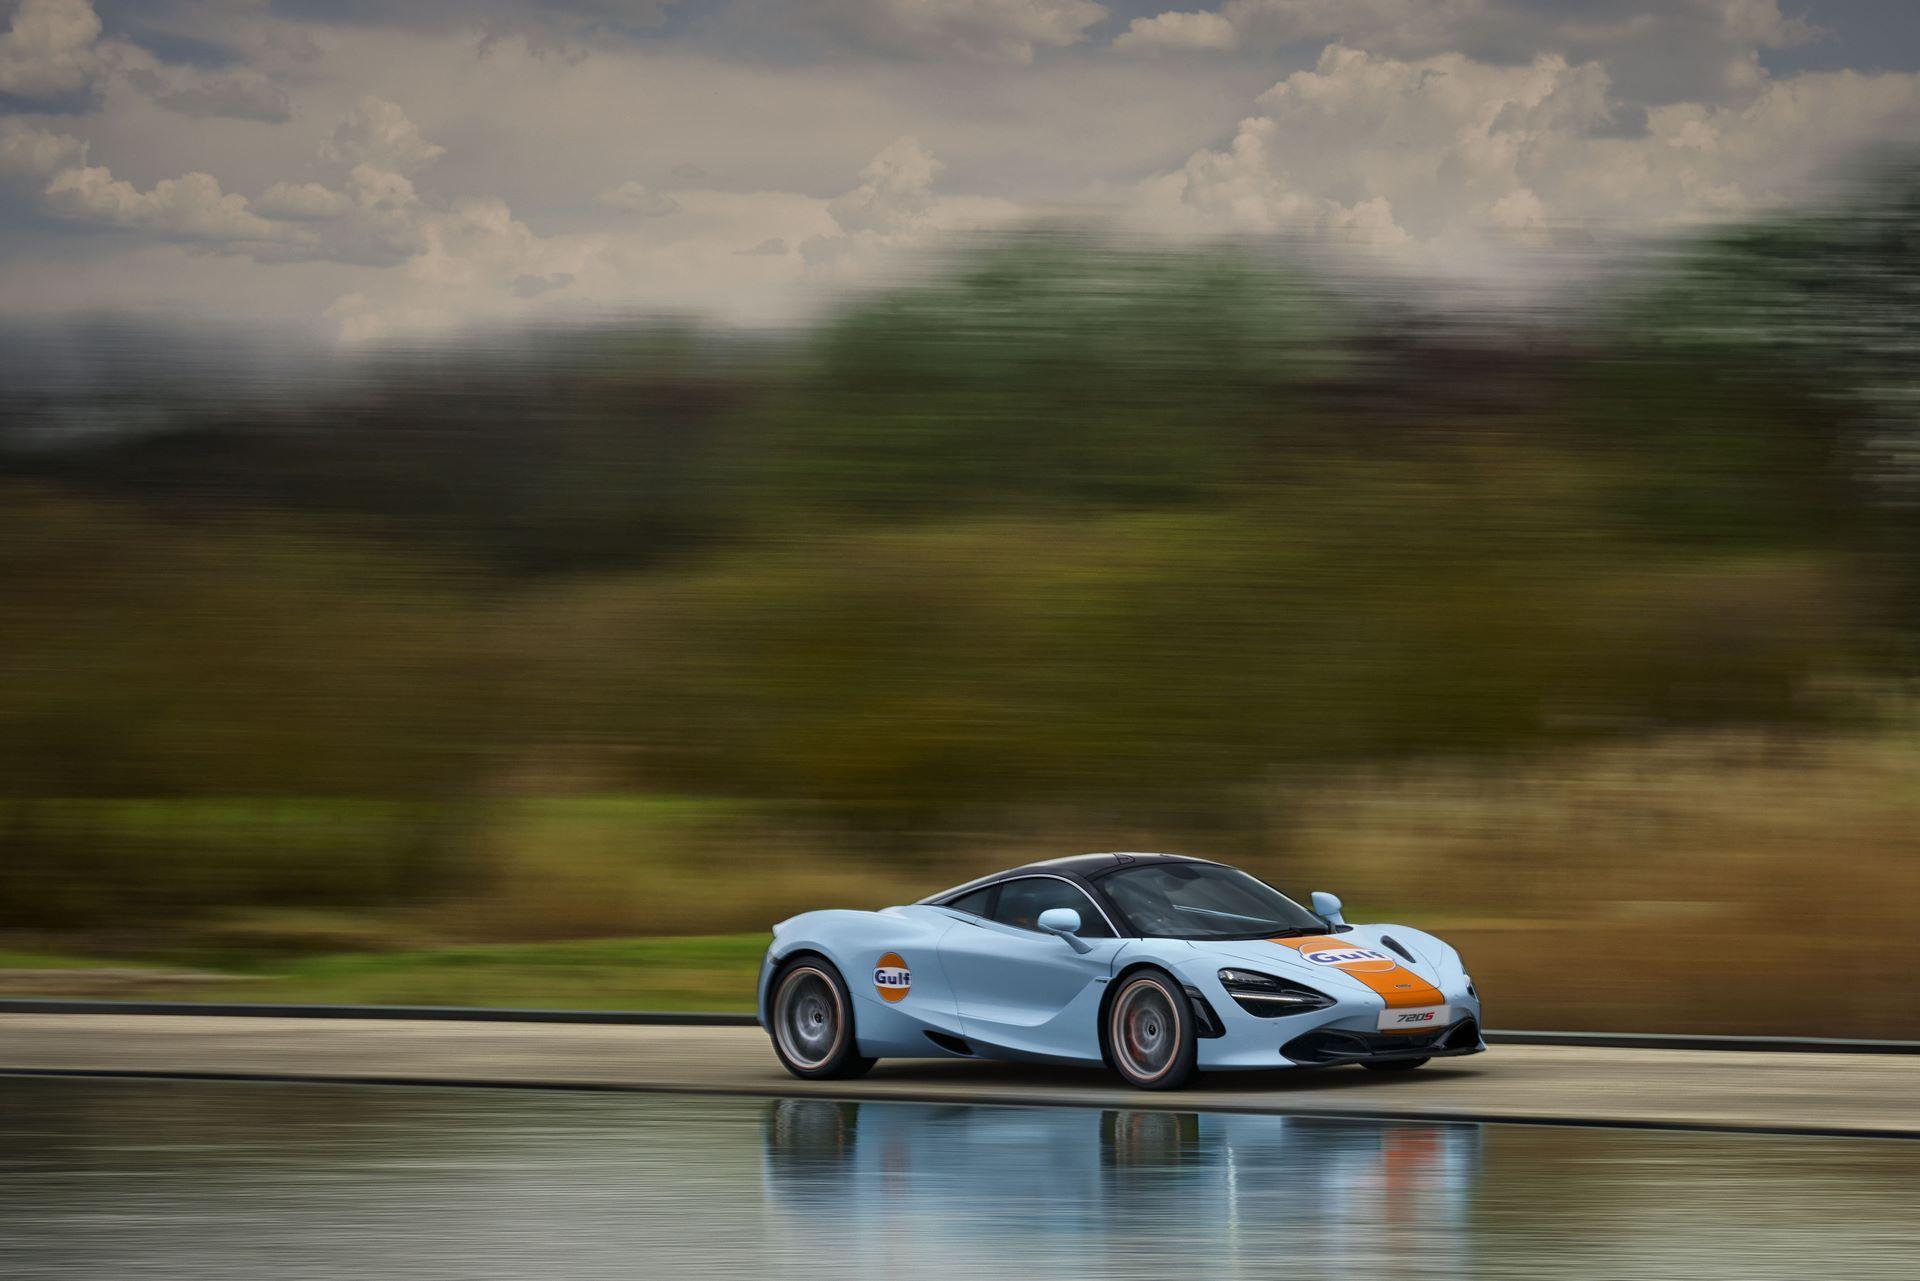 McLaren-720S-with-Gulf-livery-4